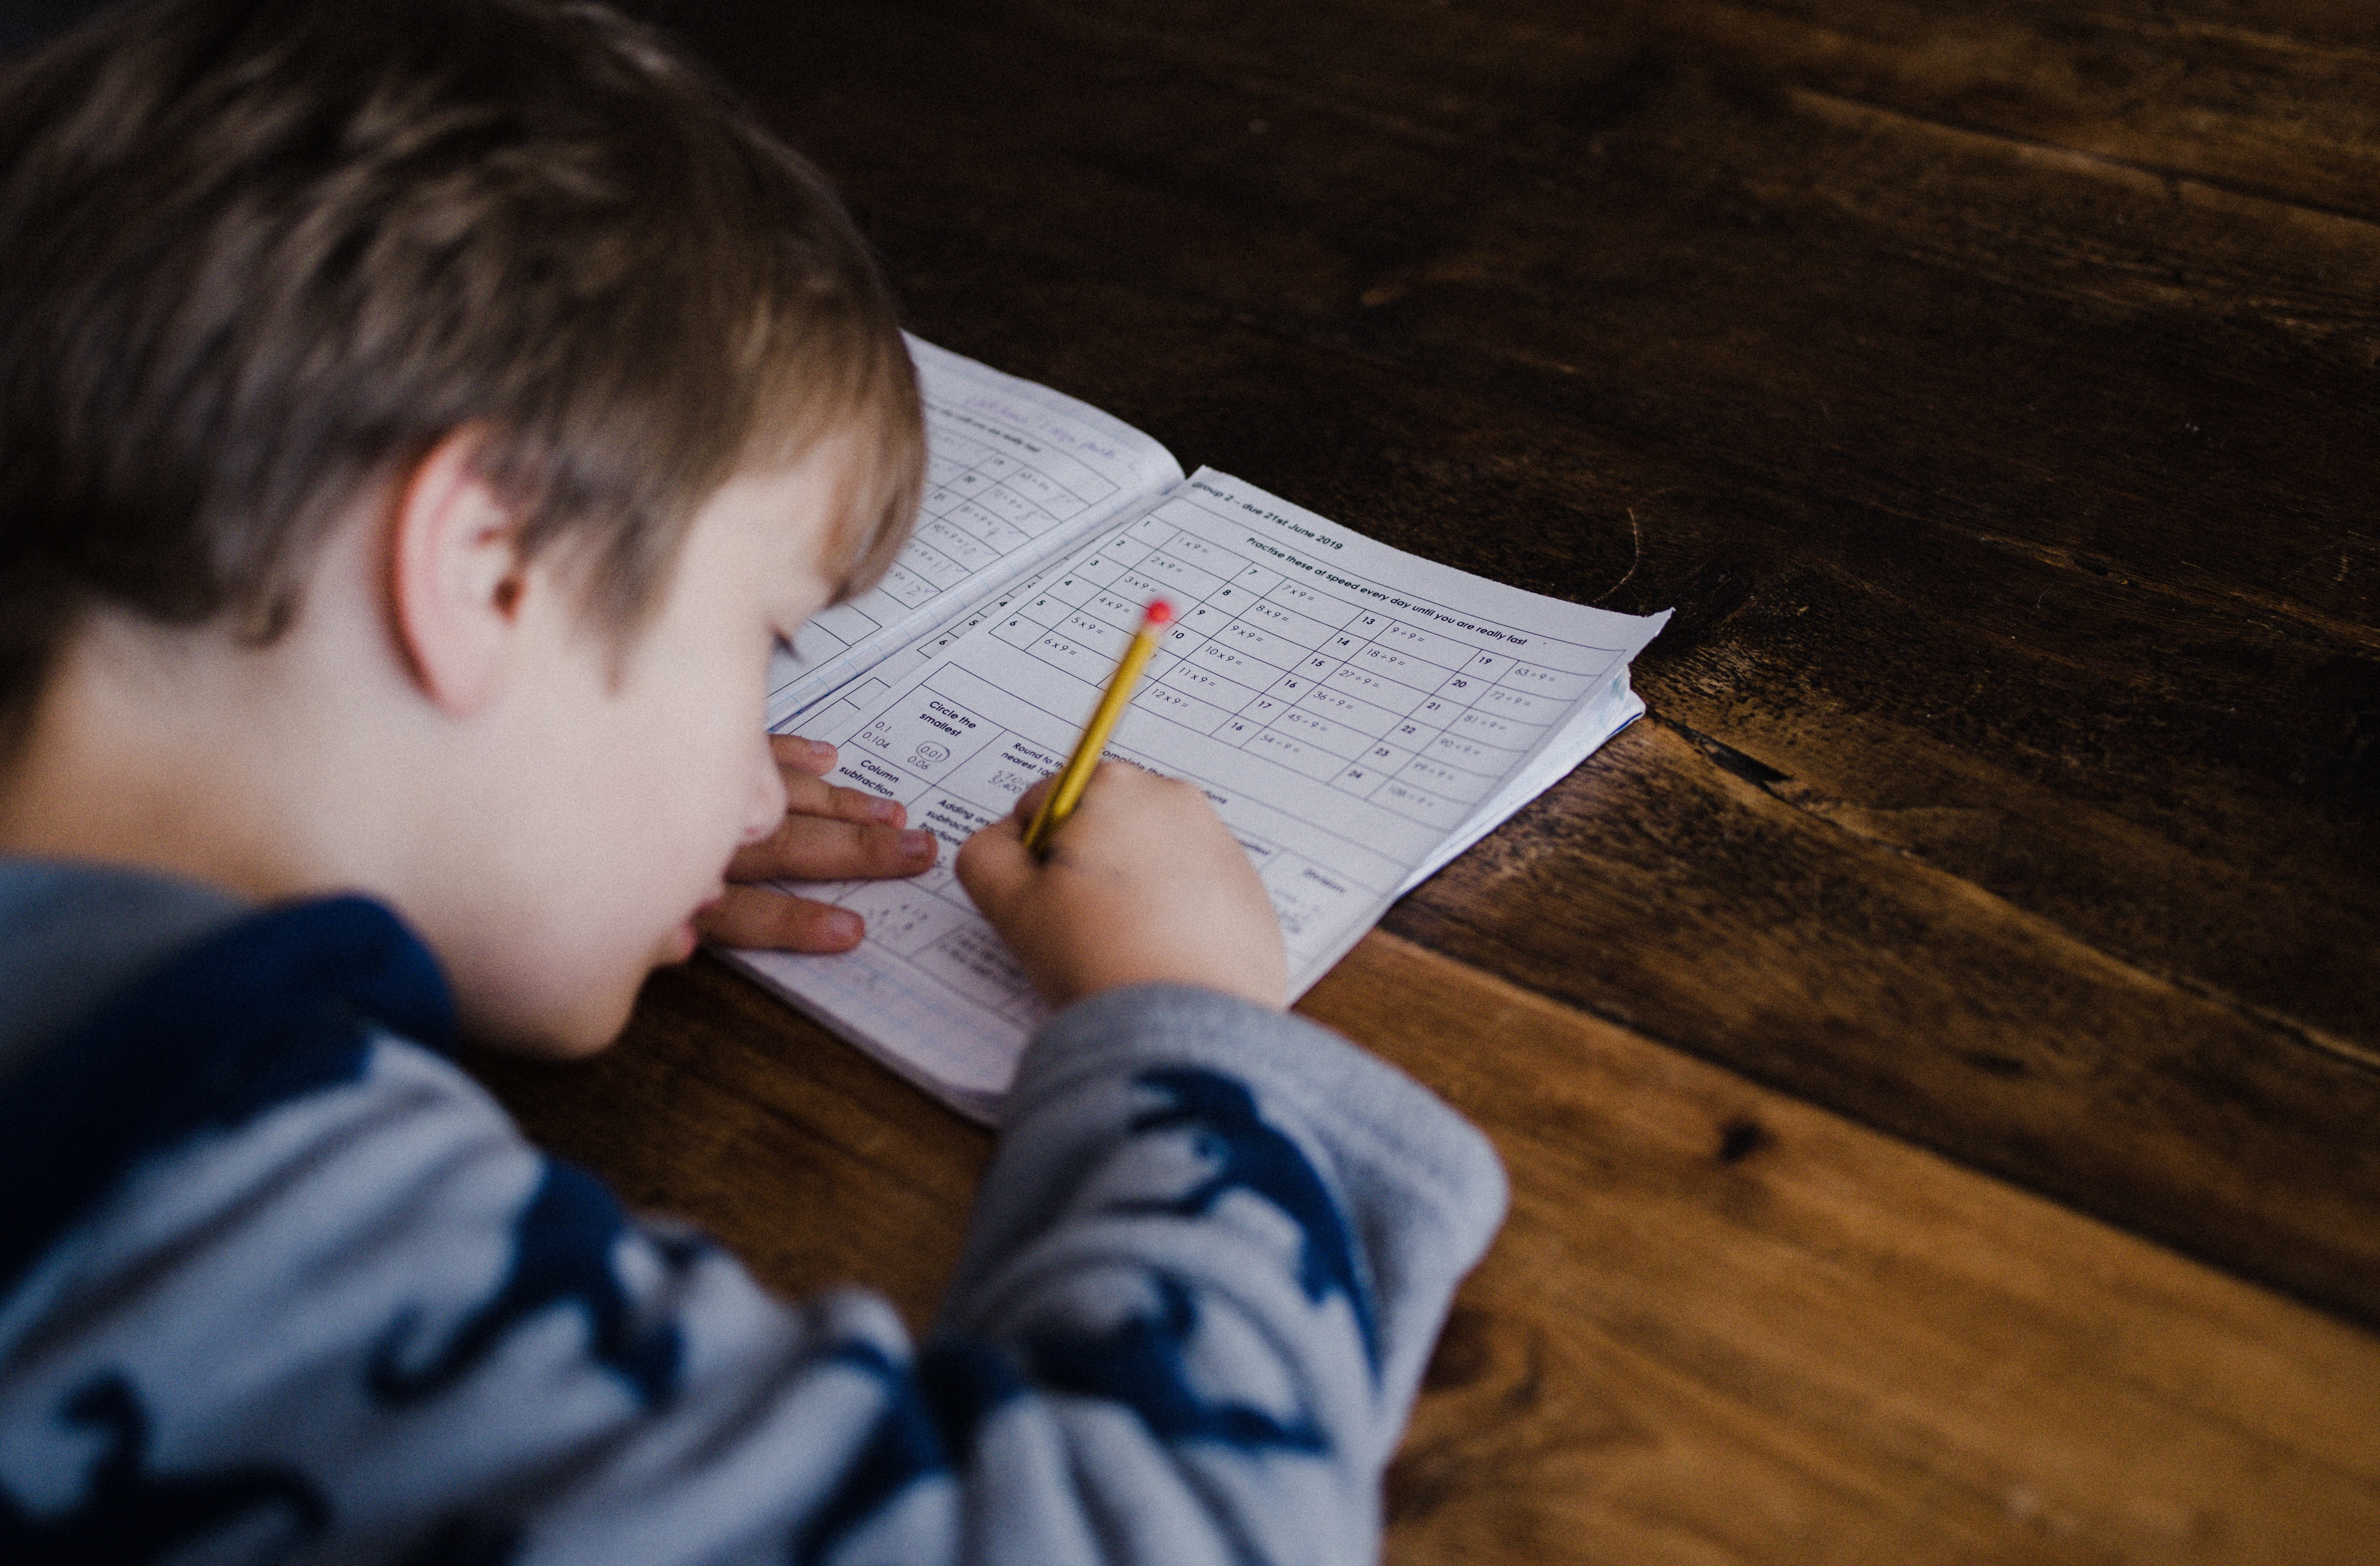 Does homework still make sense?